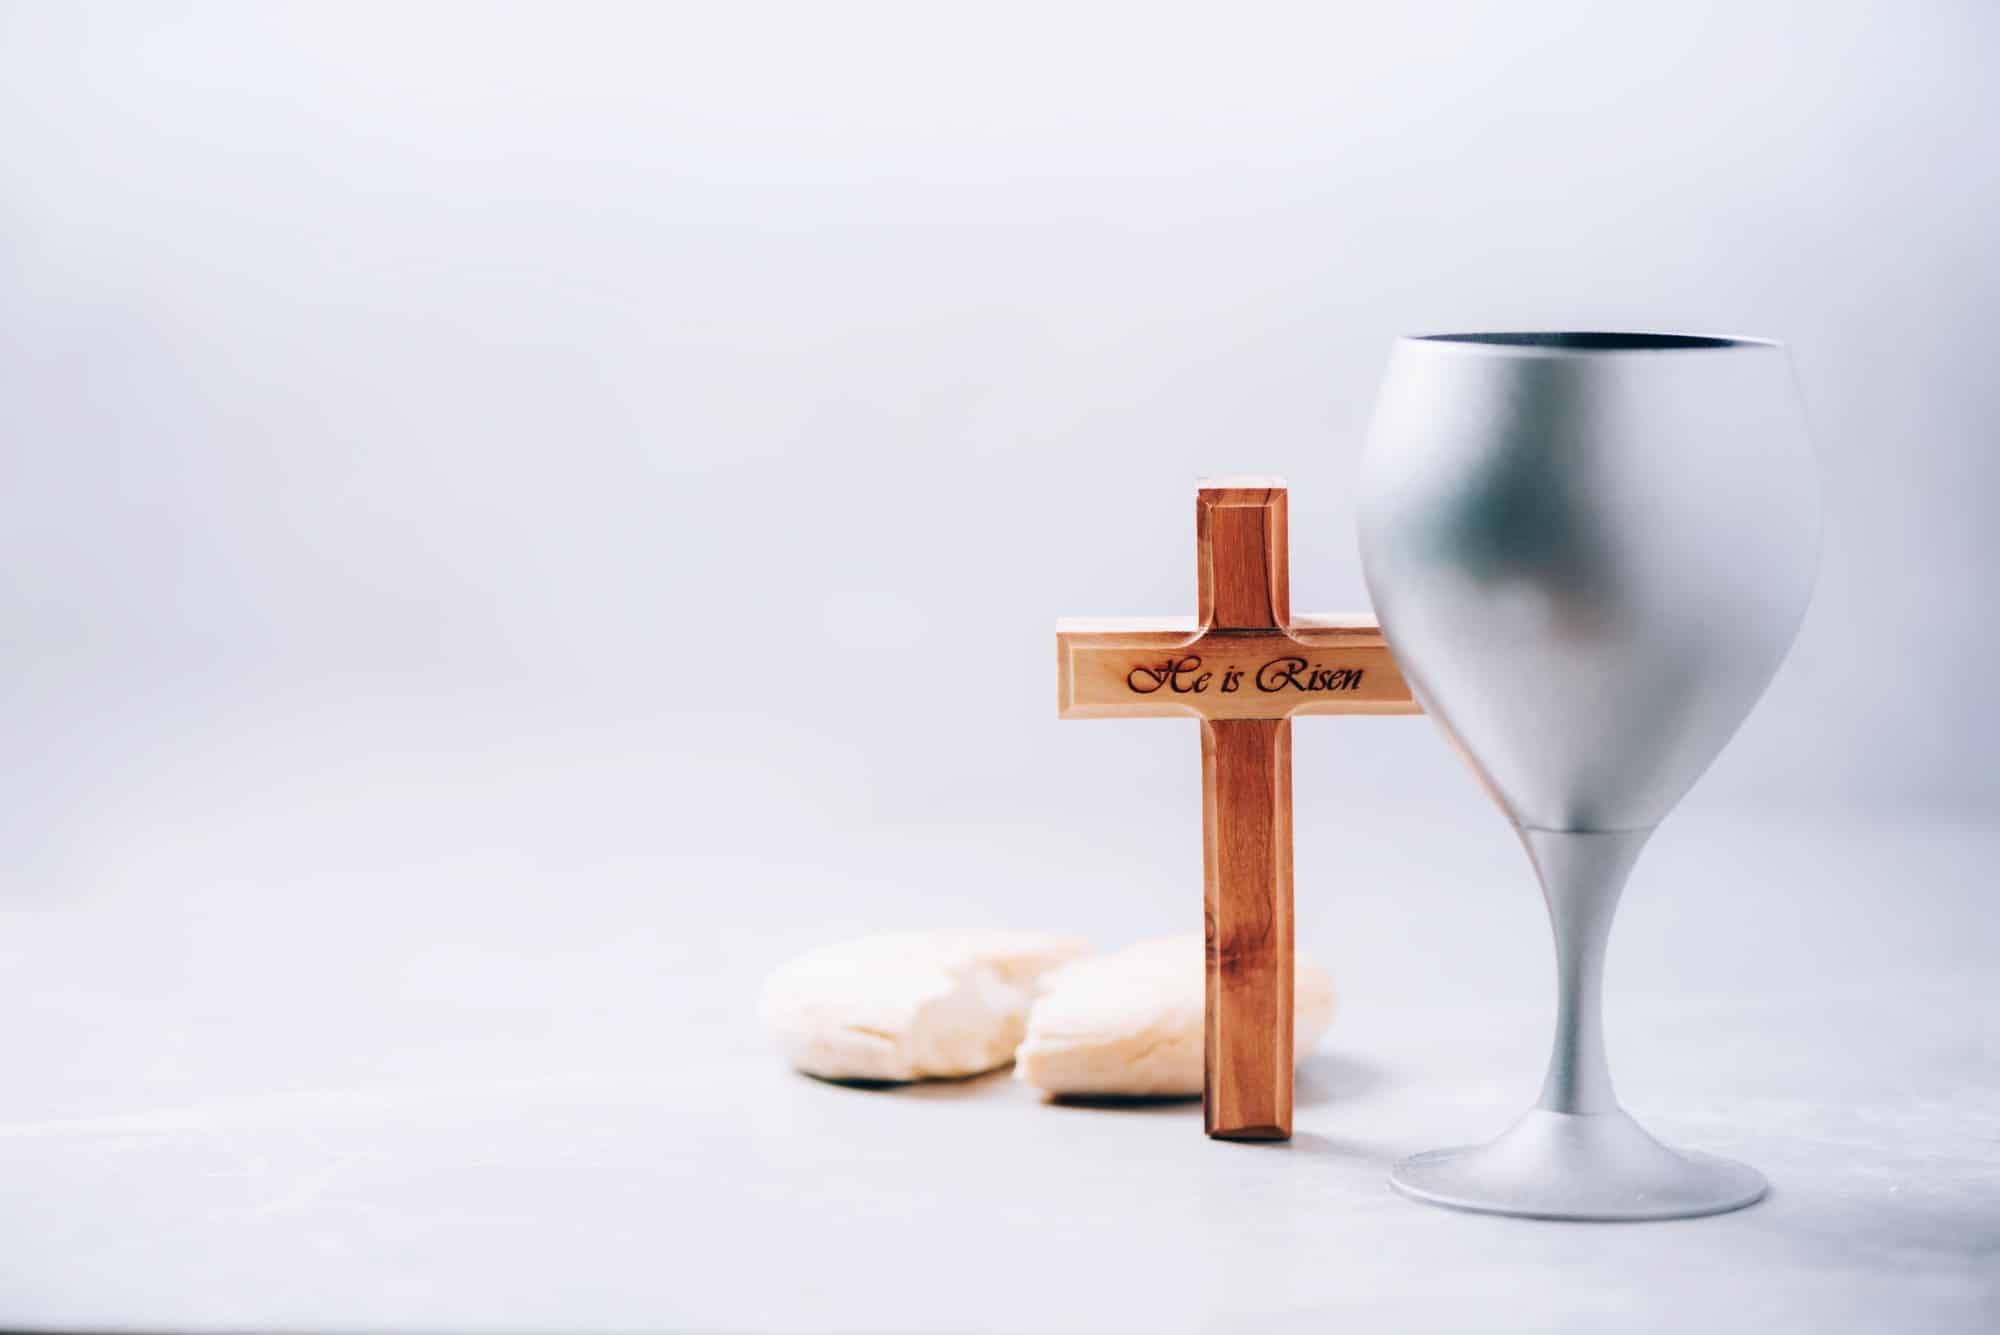 Communion still life. Unleavened bread, chalice of wine on grey background. Christian communion